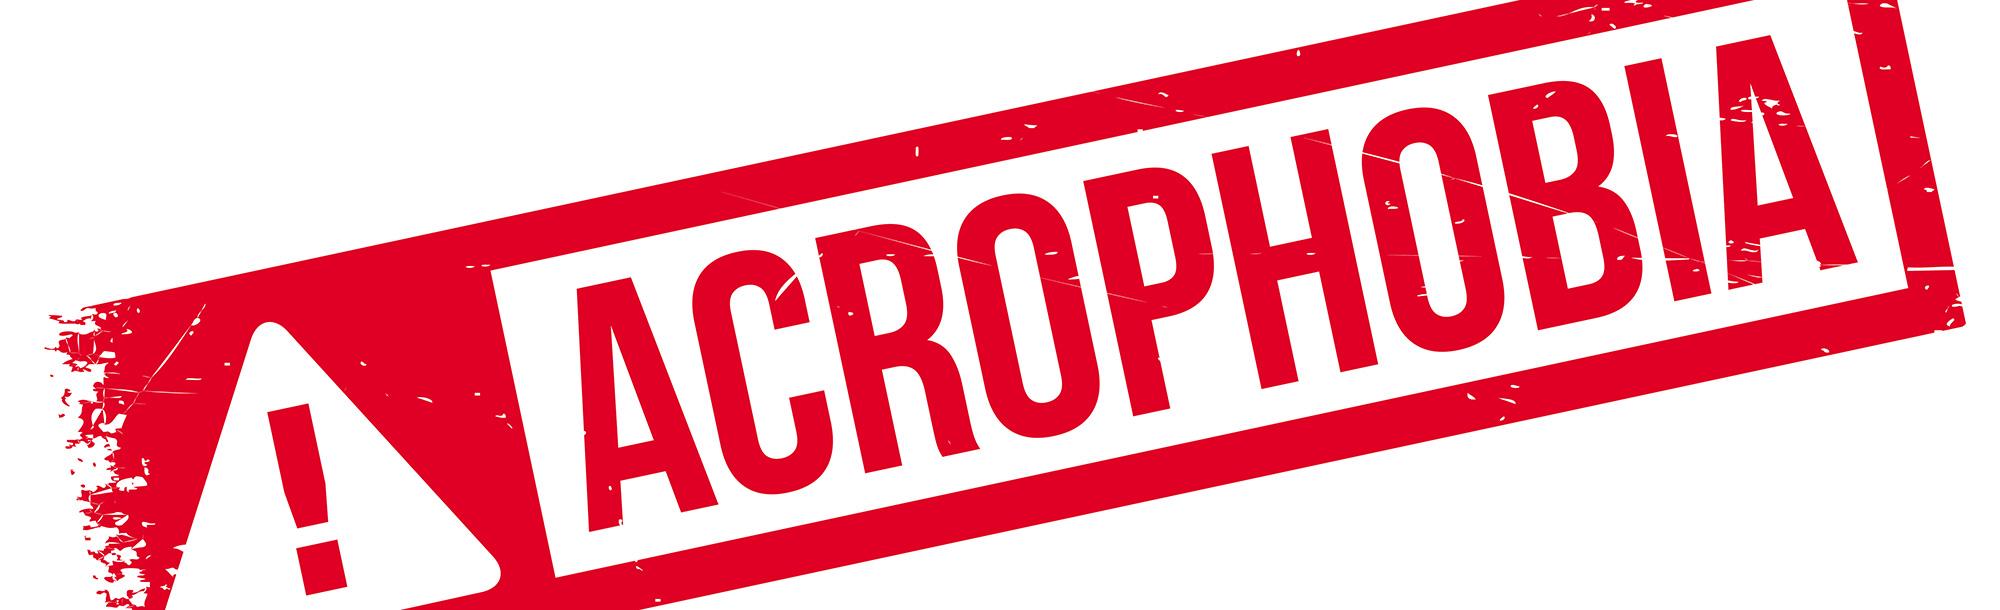 Acrophobia Review | BrainReference com